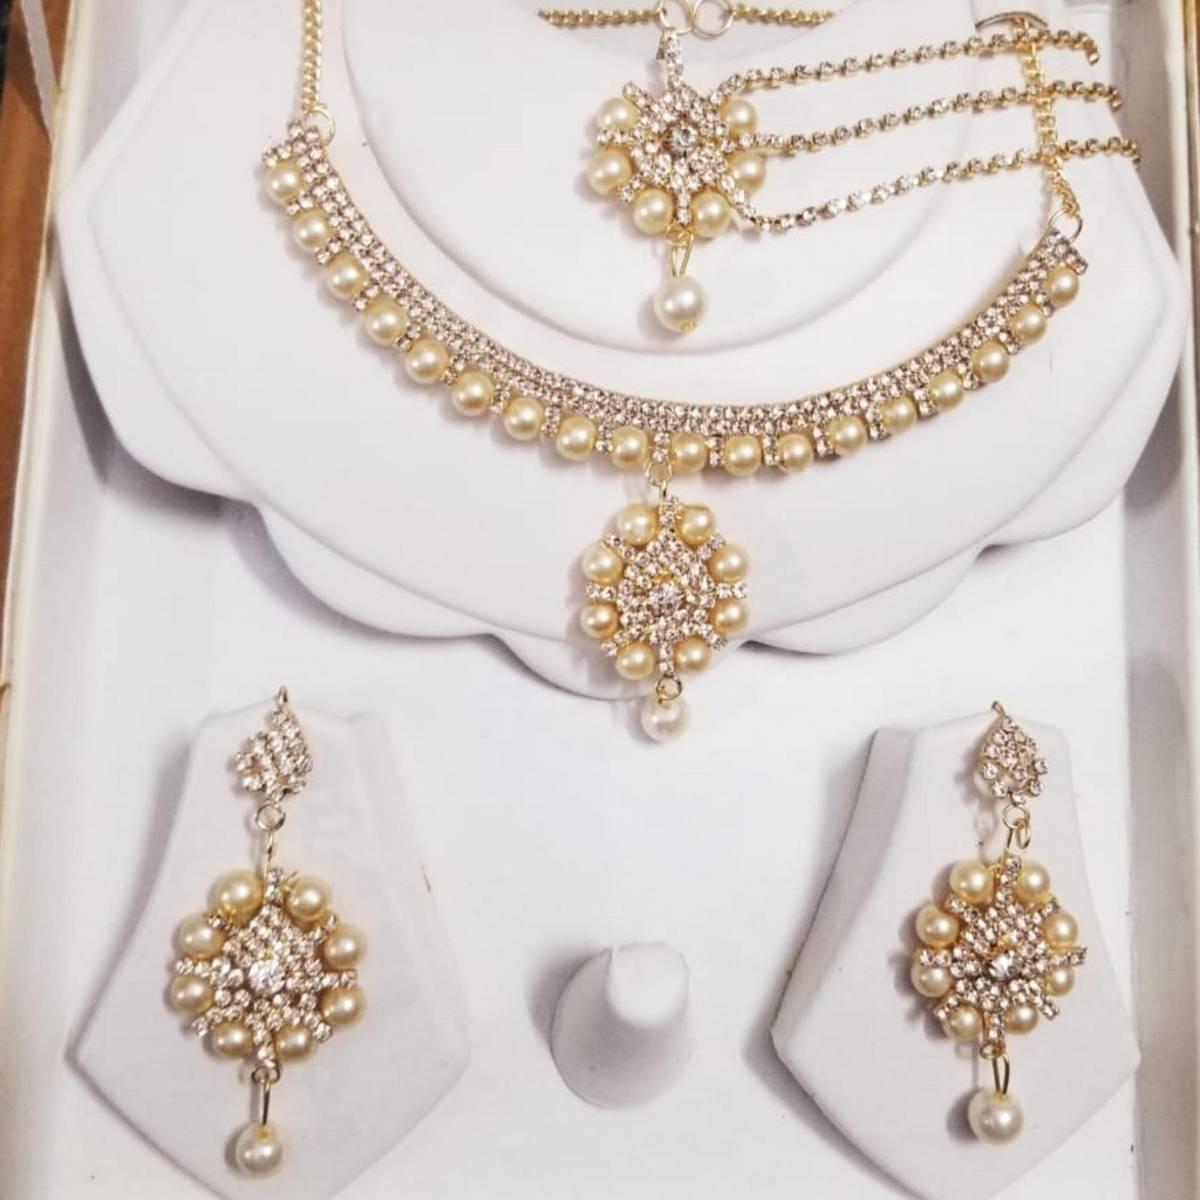 Golden Jewellery Zircon Set  with White Pearl